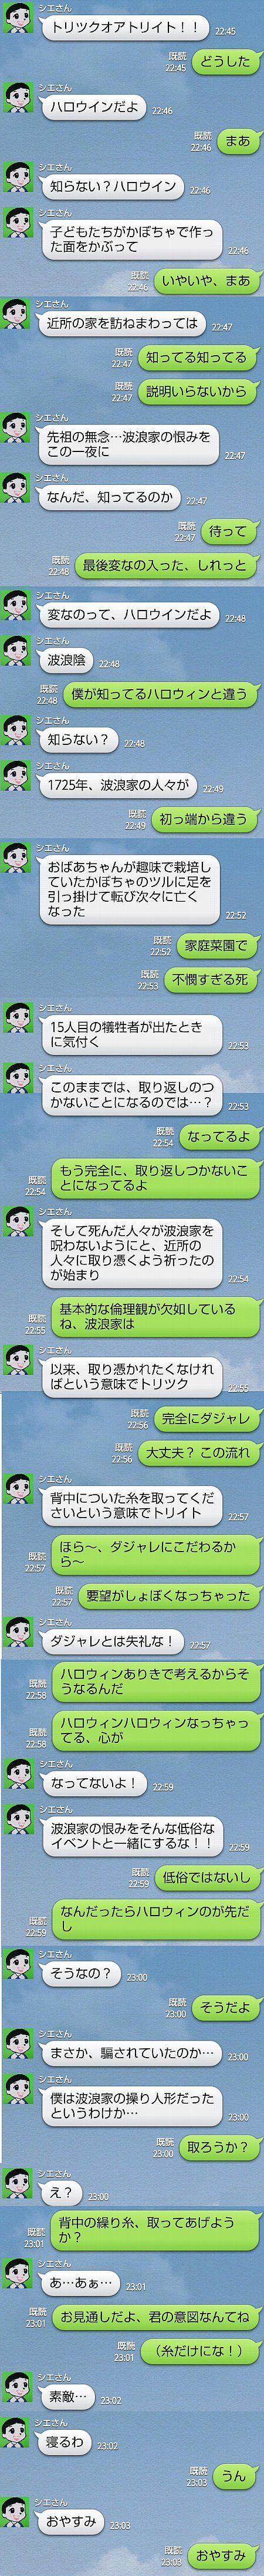 20131101033422_950_1